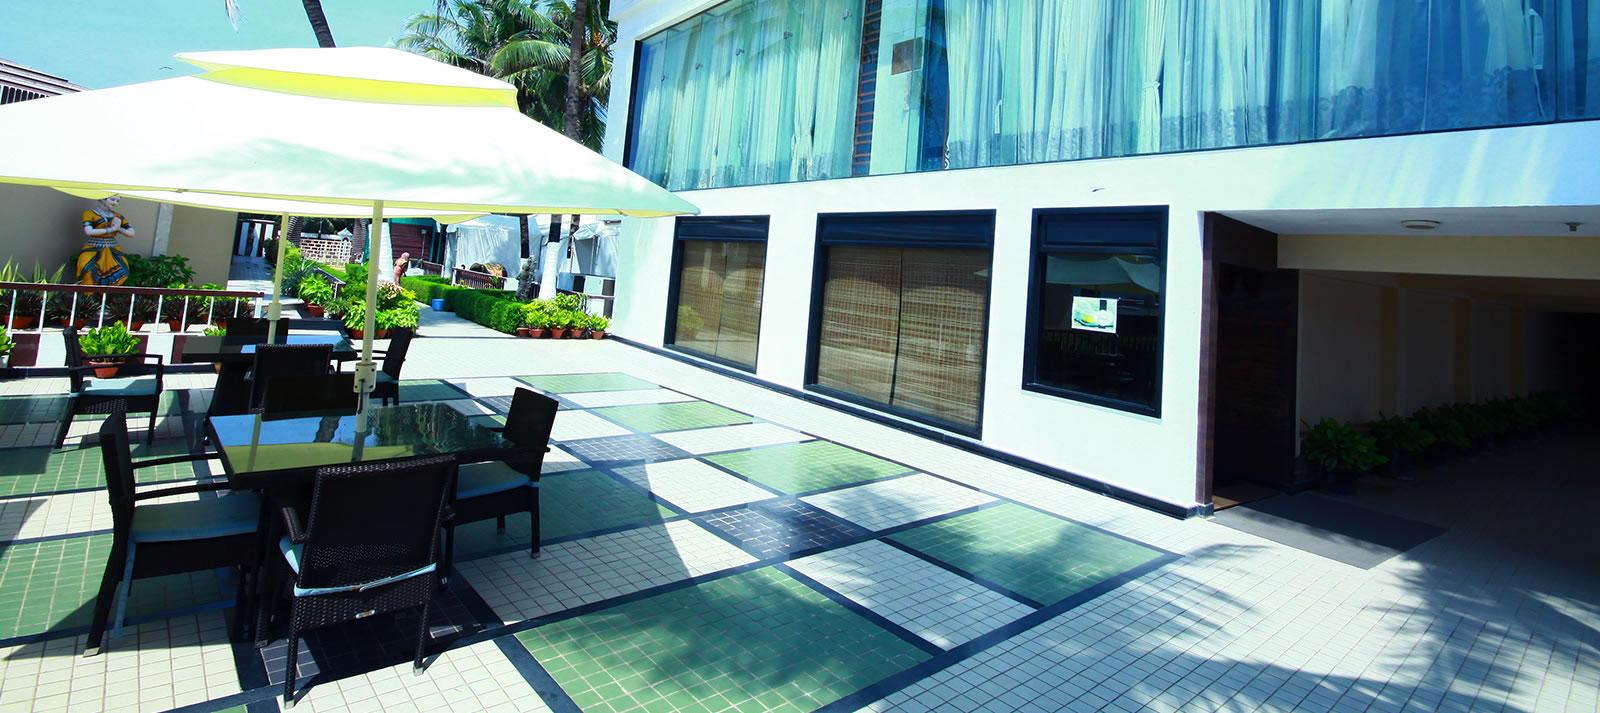 1487079427-Hotel_Holiday_Resort_6.jpg